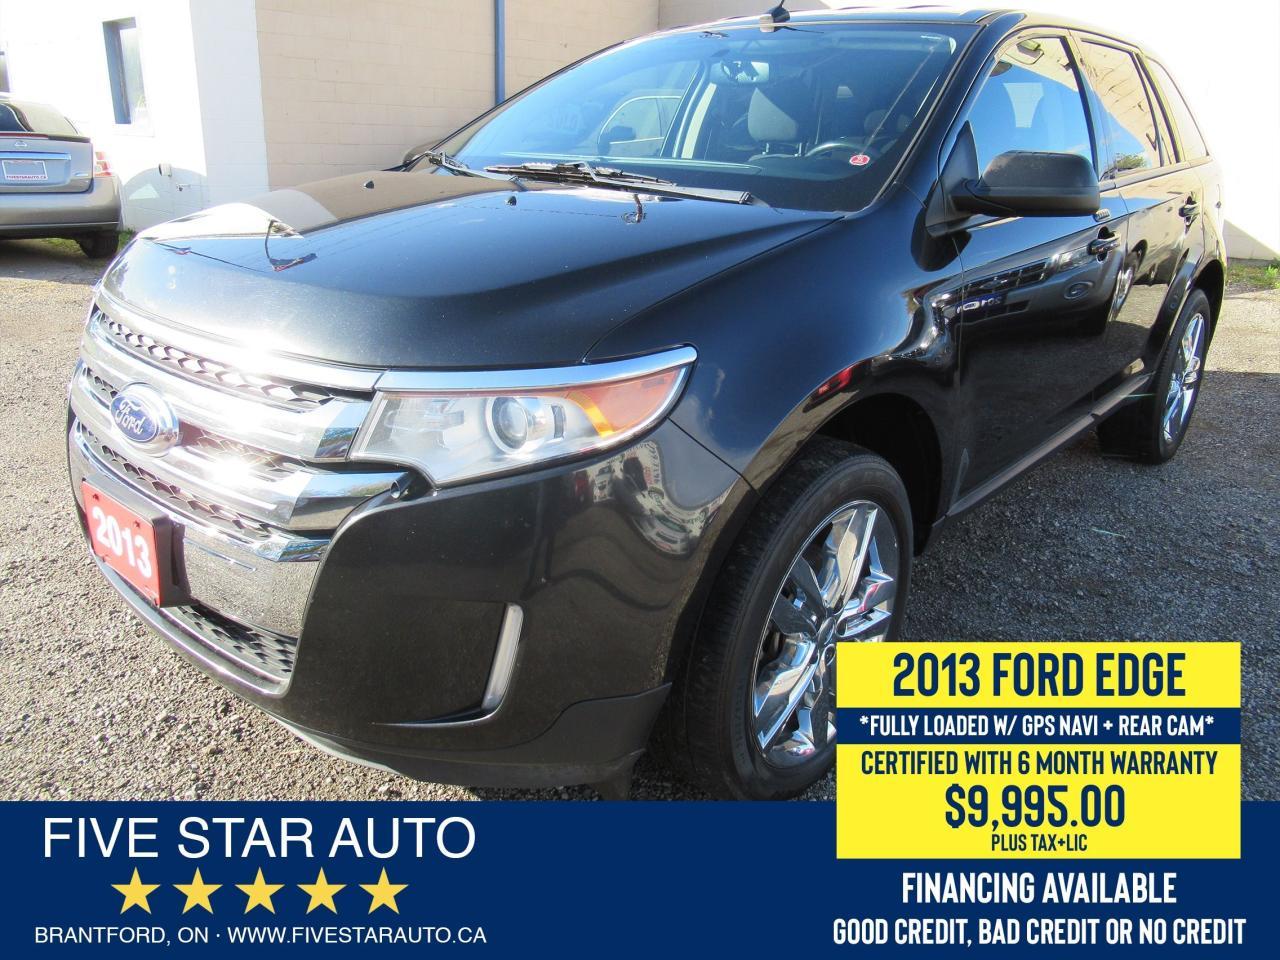 2013 Ford Edge SEL - Certified w/ 6 Month Warranty